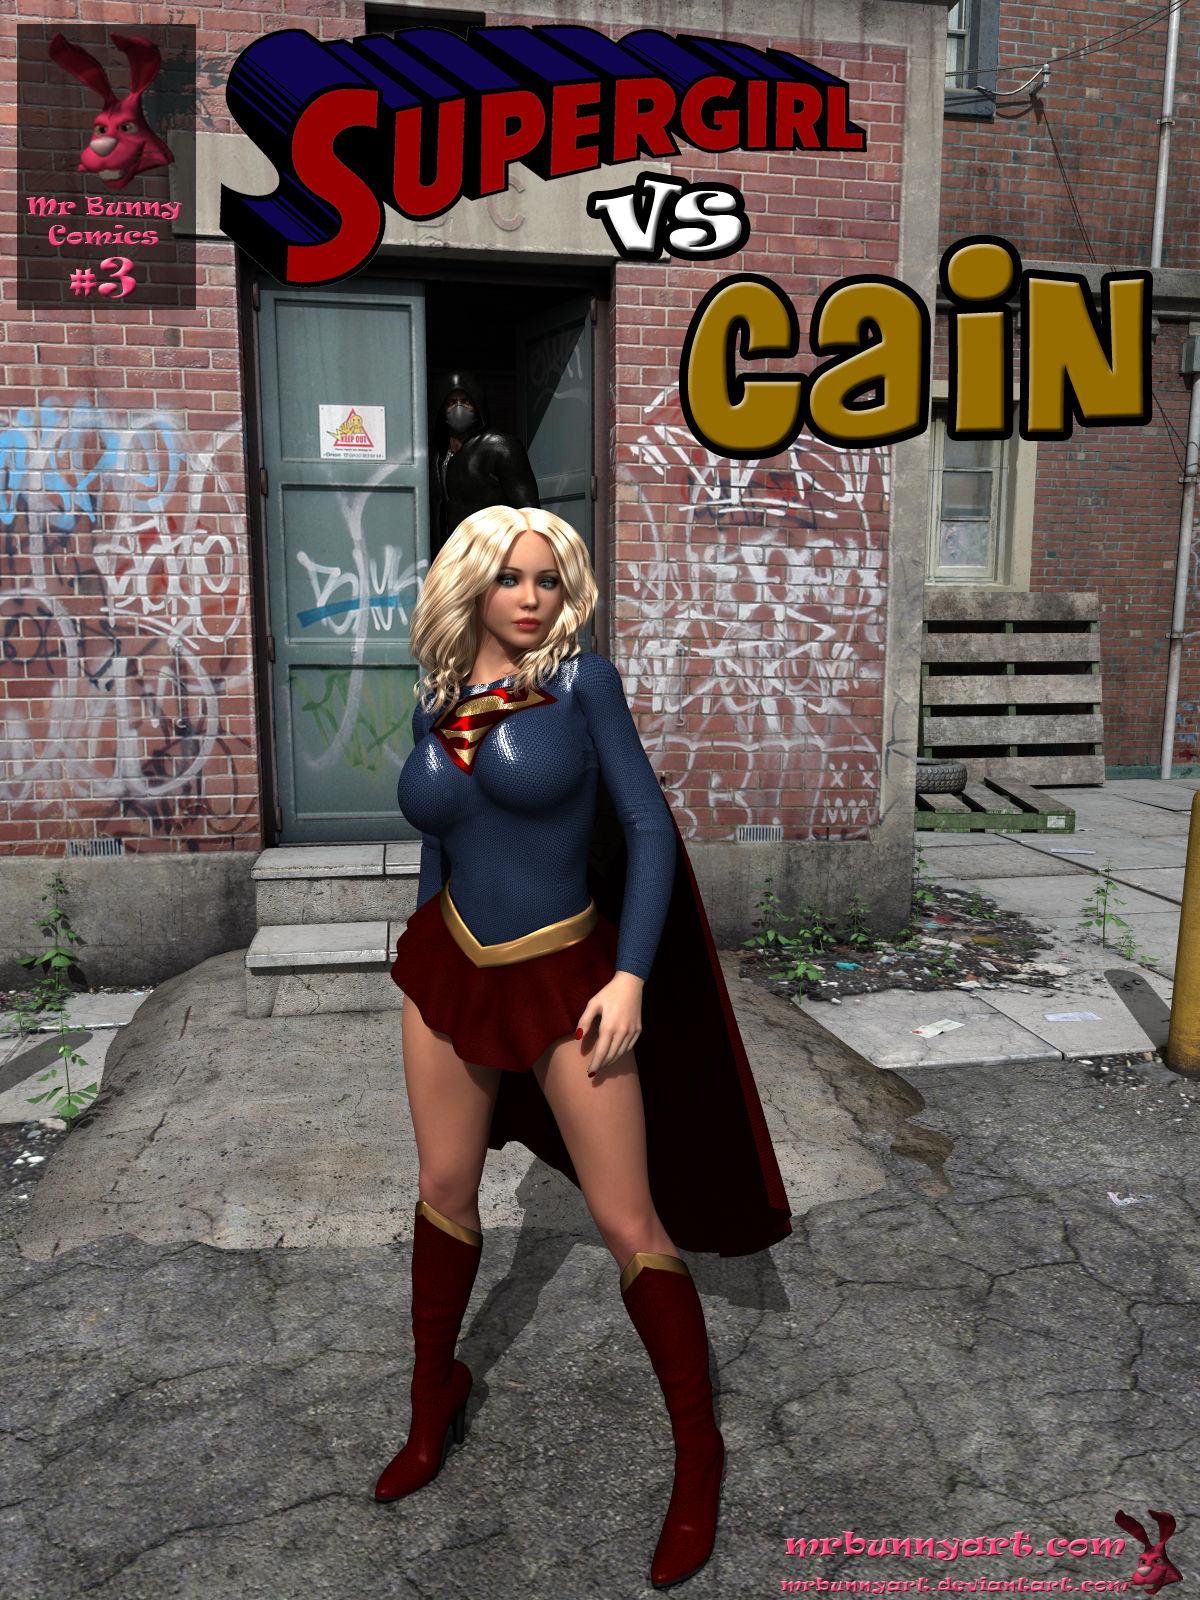 Supergirl vs Cain- MrBunnyArt image 1